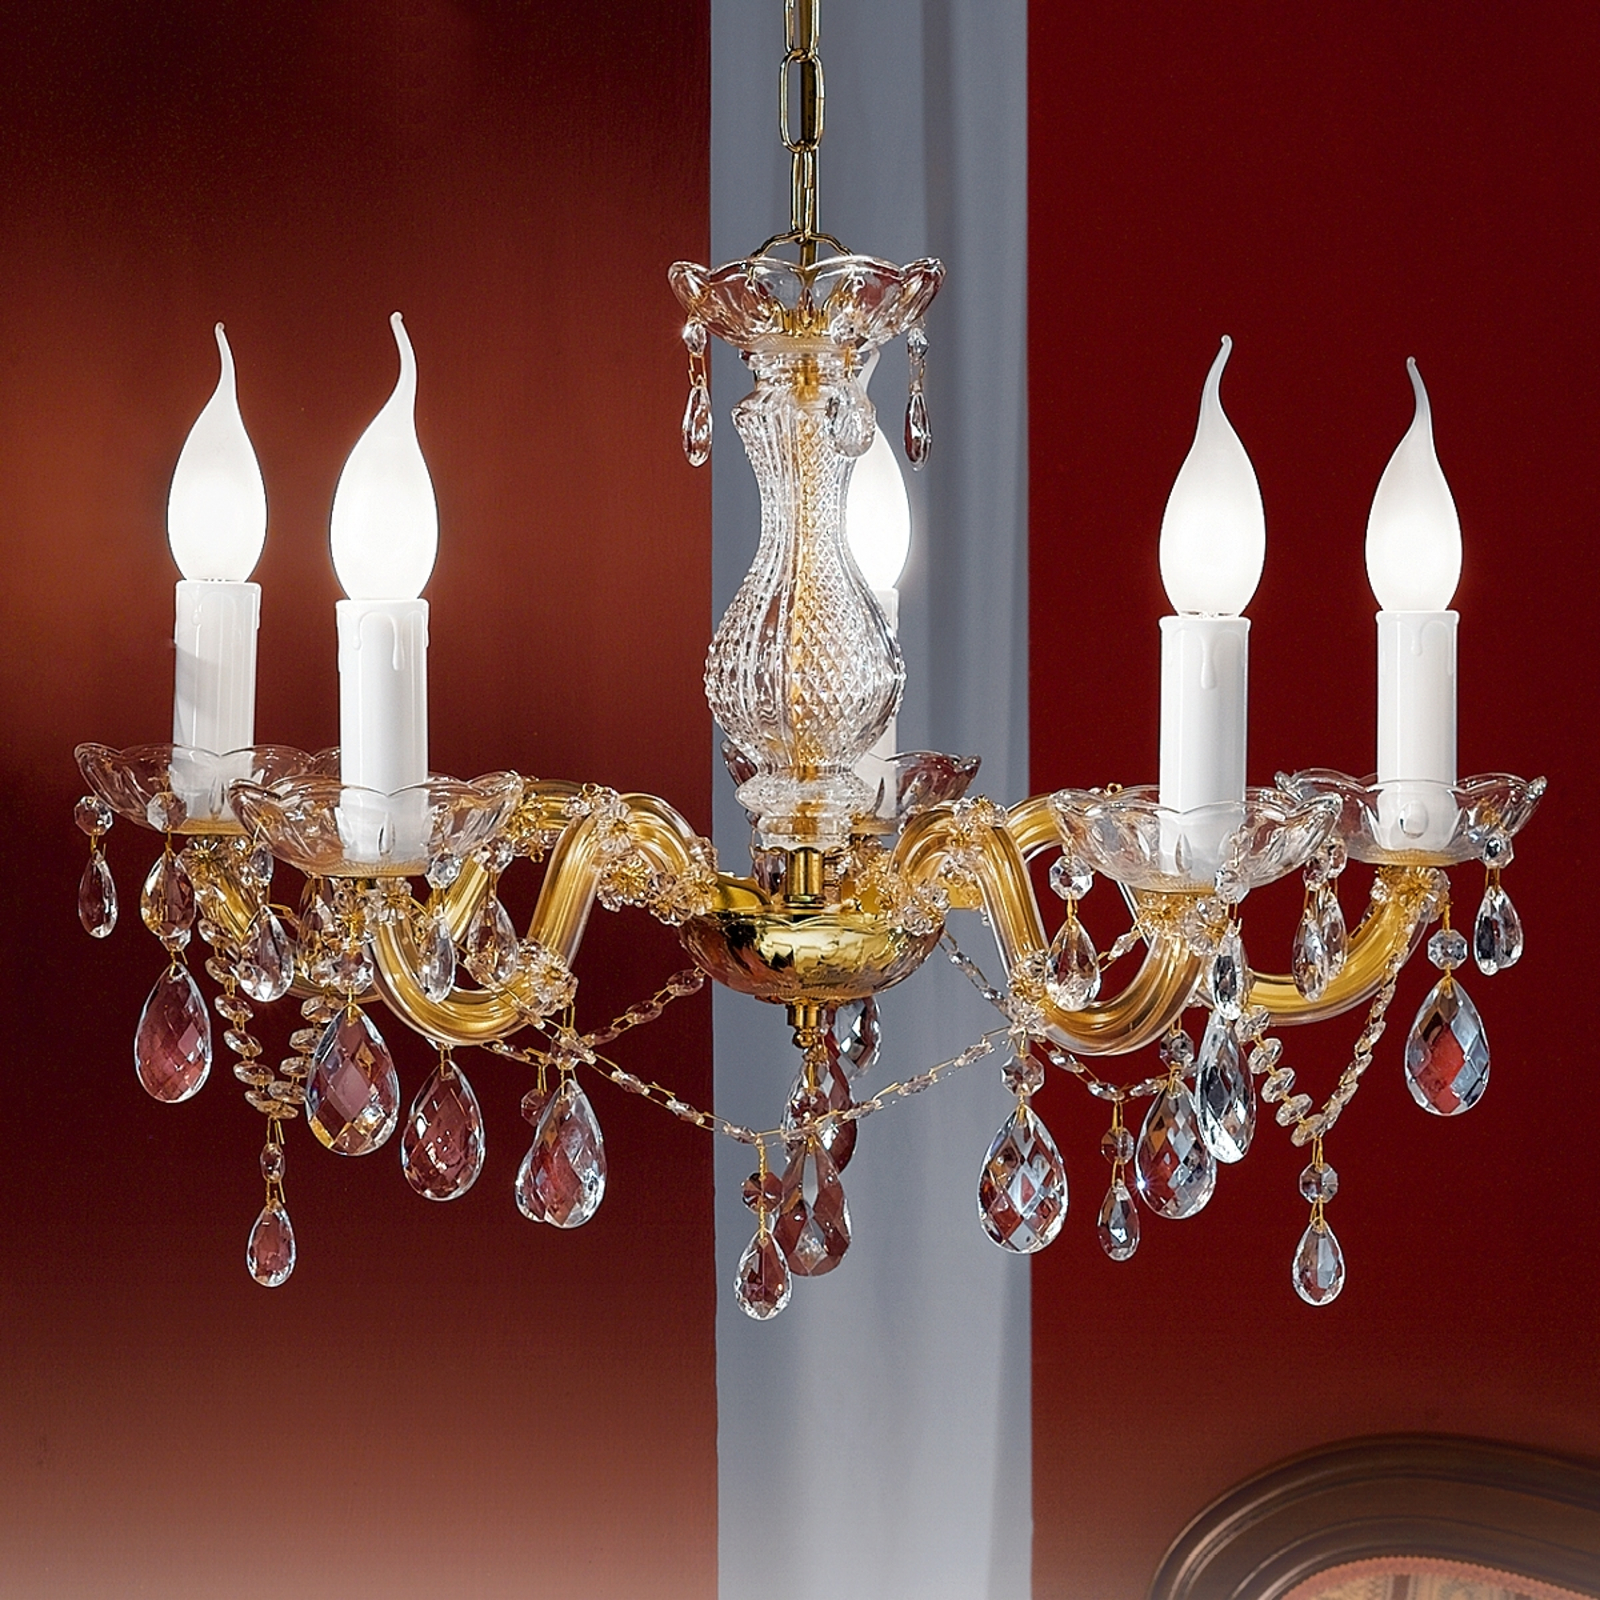 Ljuskrona Dolores med hängen, 5 lampor